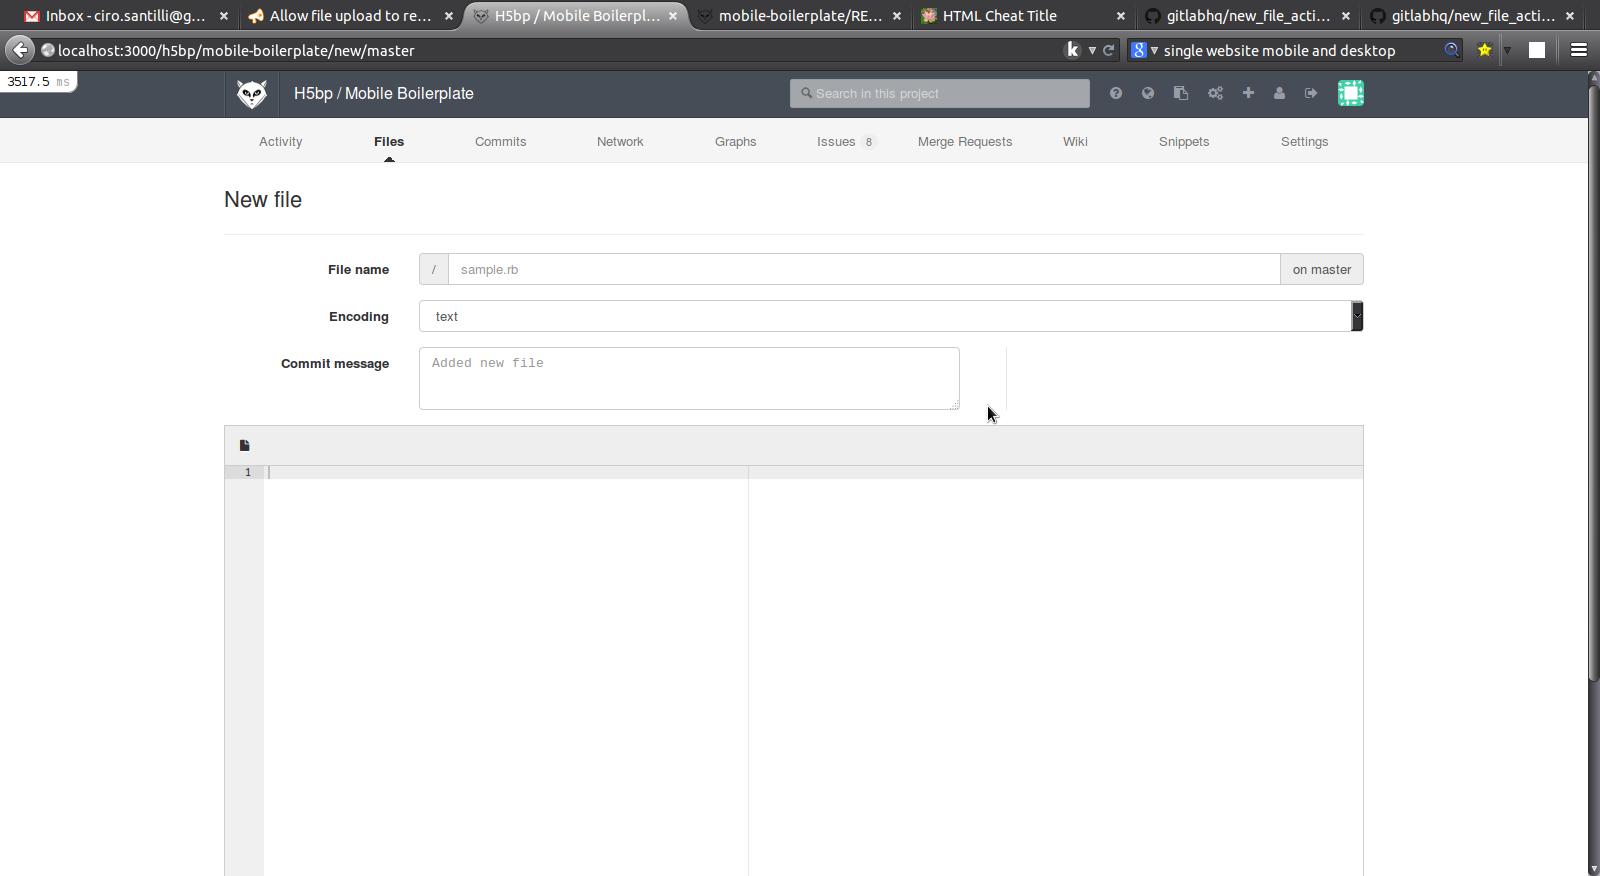 screenshot from 2014-08-12 20 40 18 commit new file resize vertical break